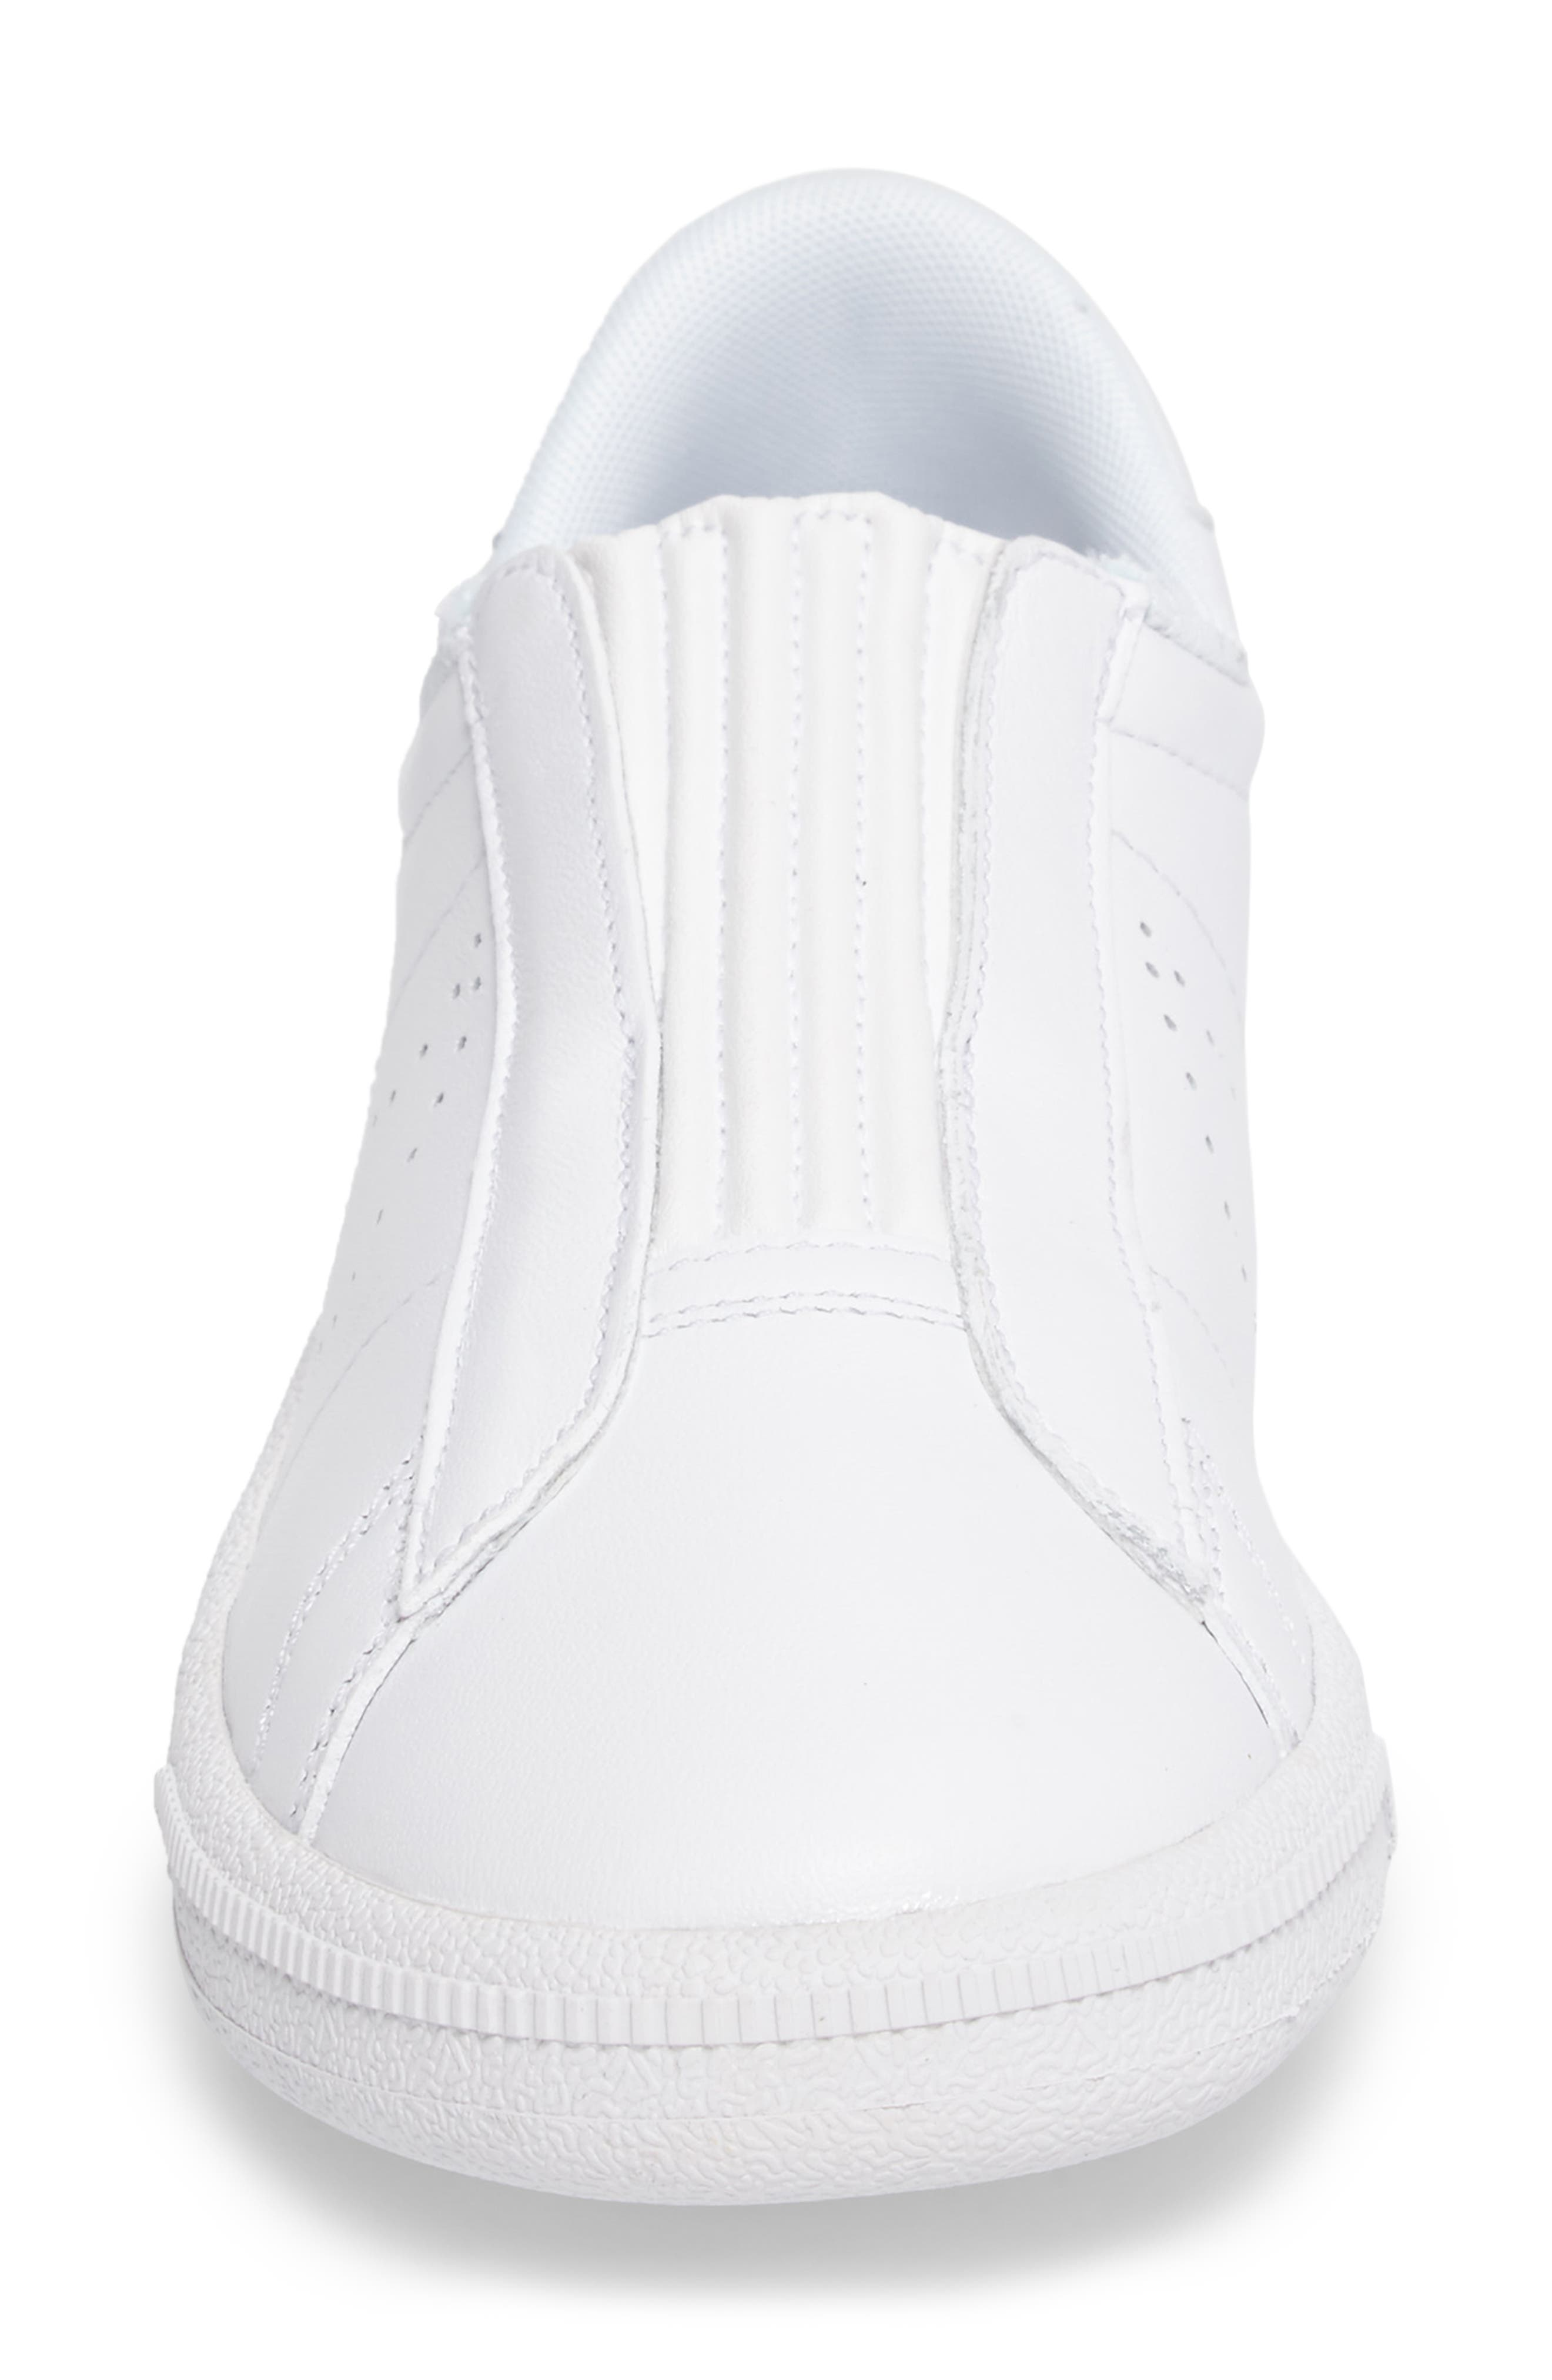 Classic EZ Slip-On Tennis Shoe,                             Alternate thumbnail 4, color,                             White/ White/ Black